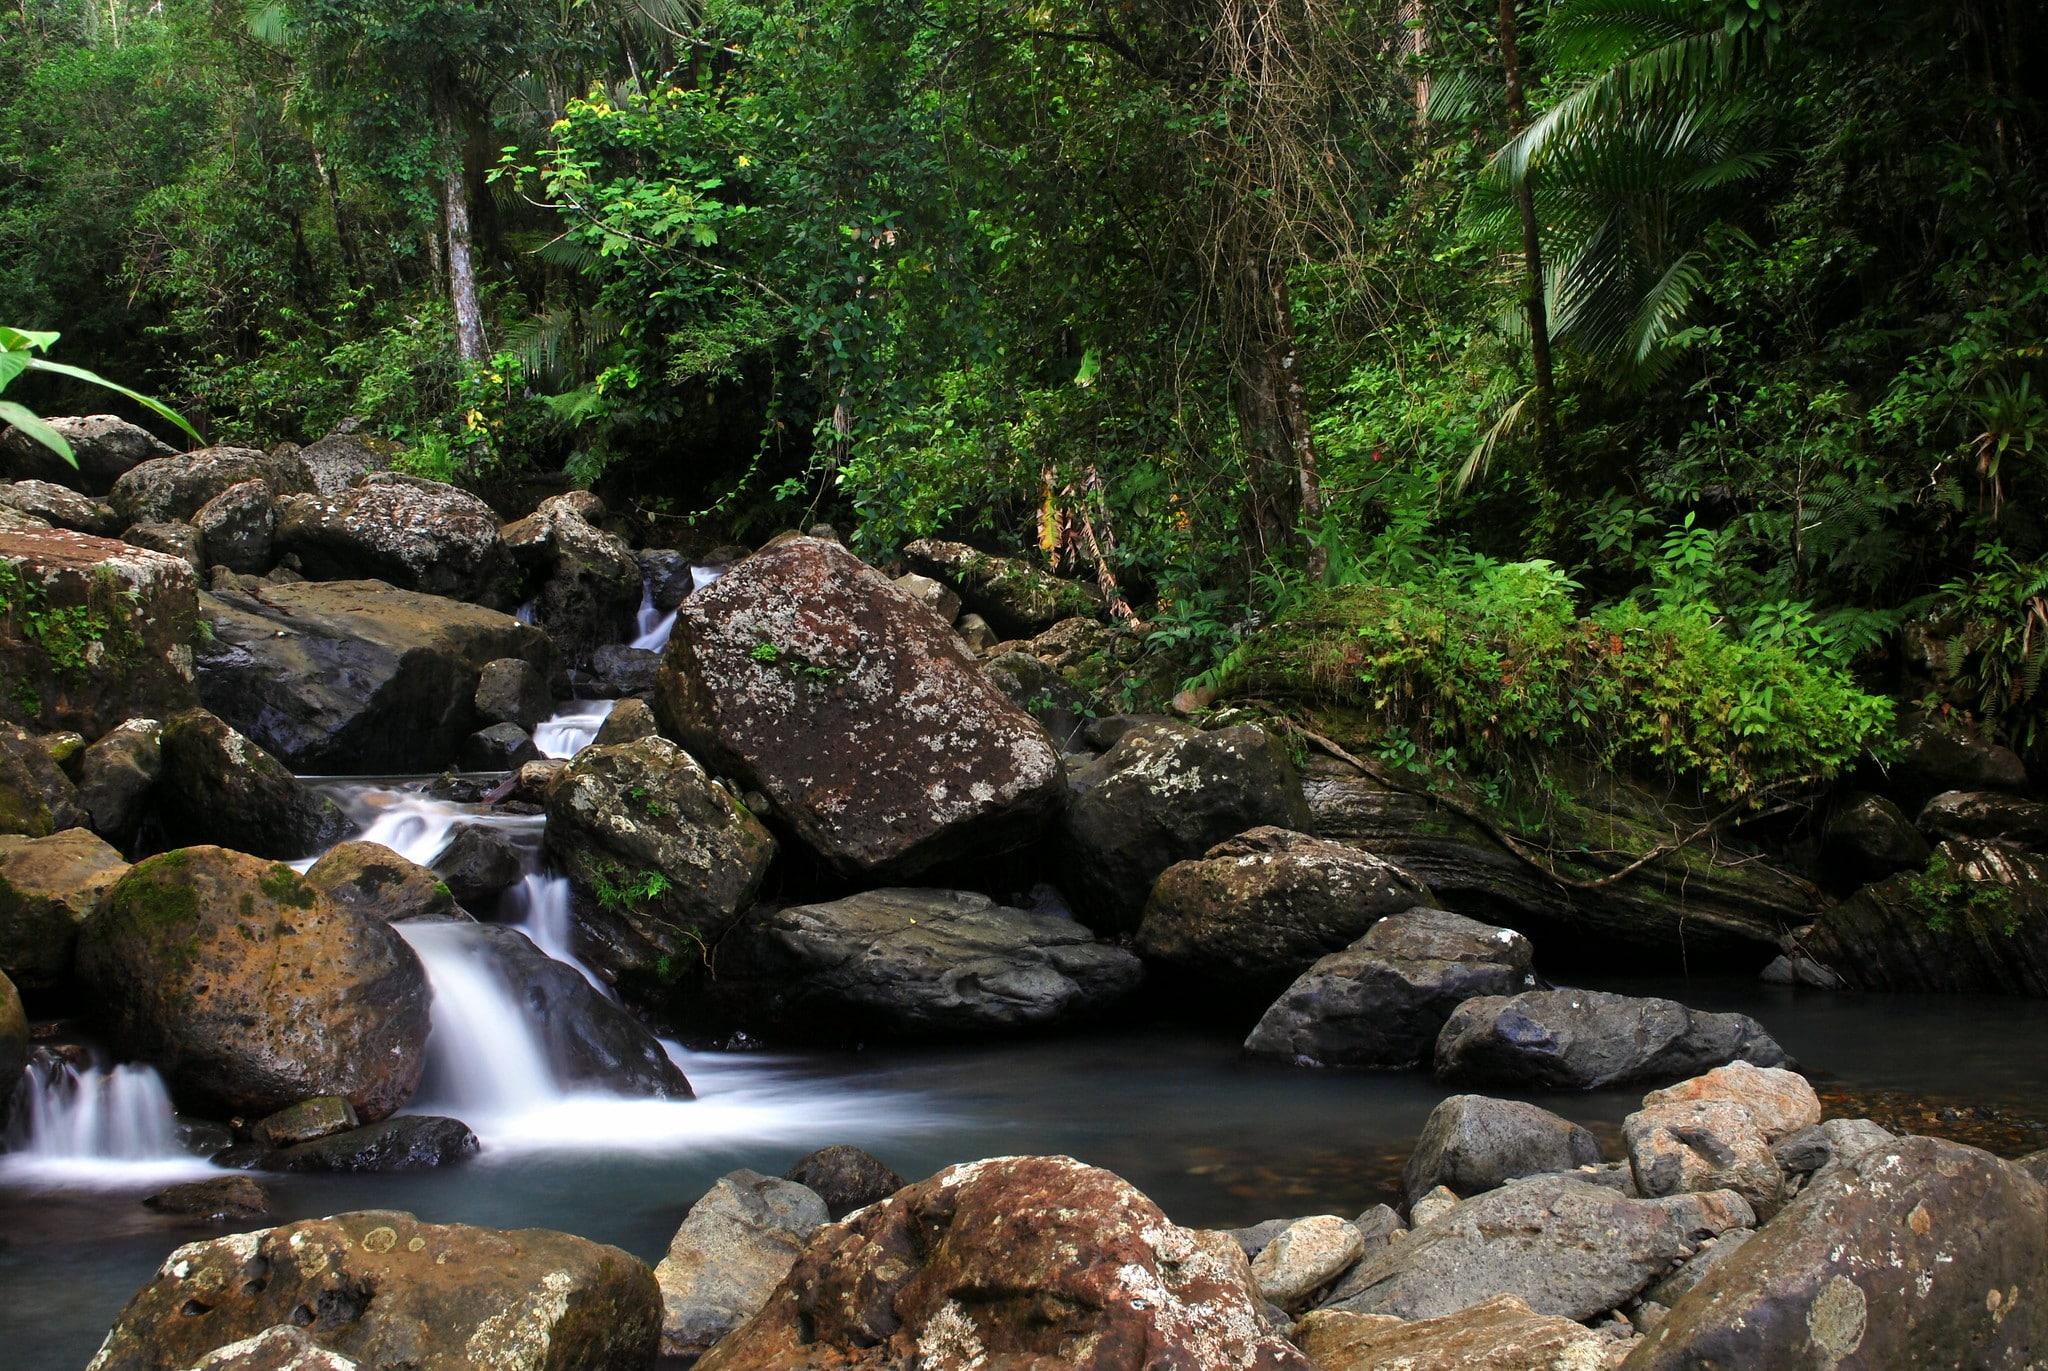 Puerto Rico's rainforest has some amazing waterfalls